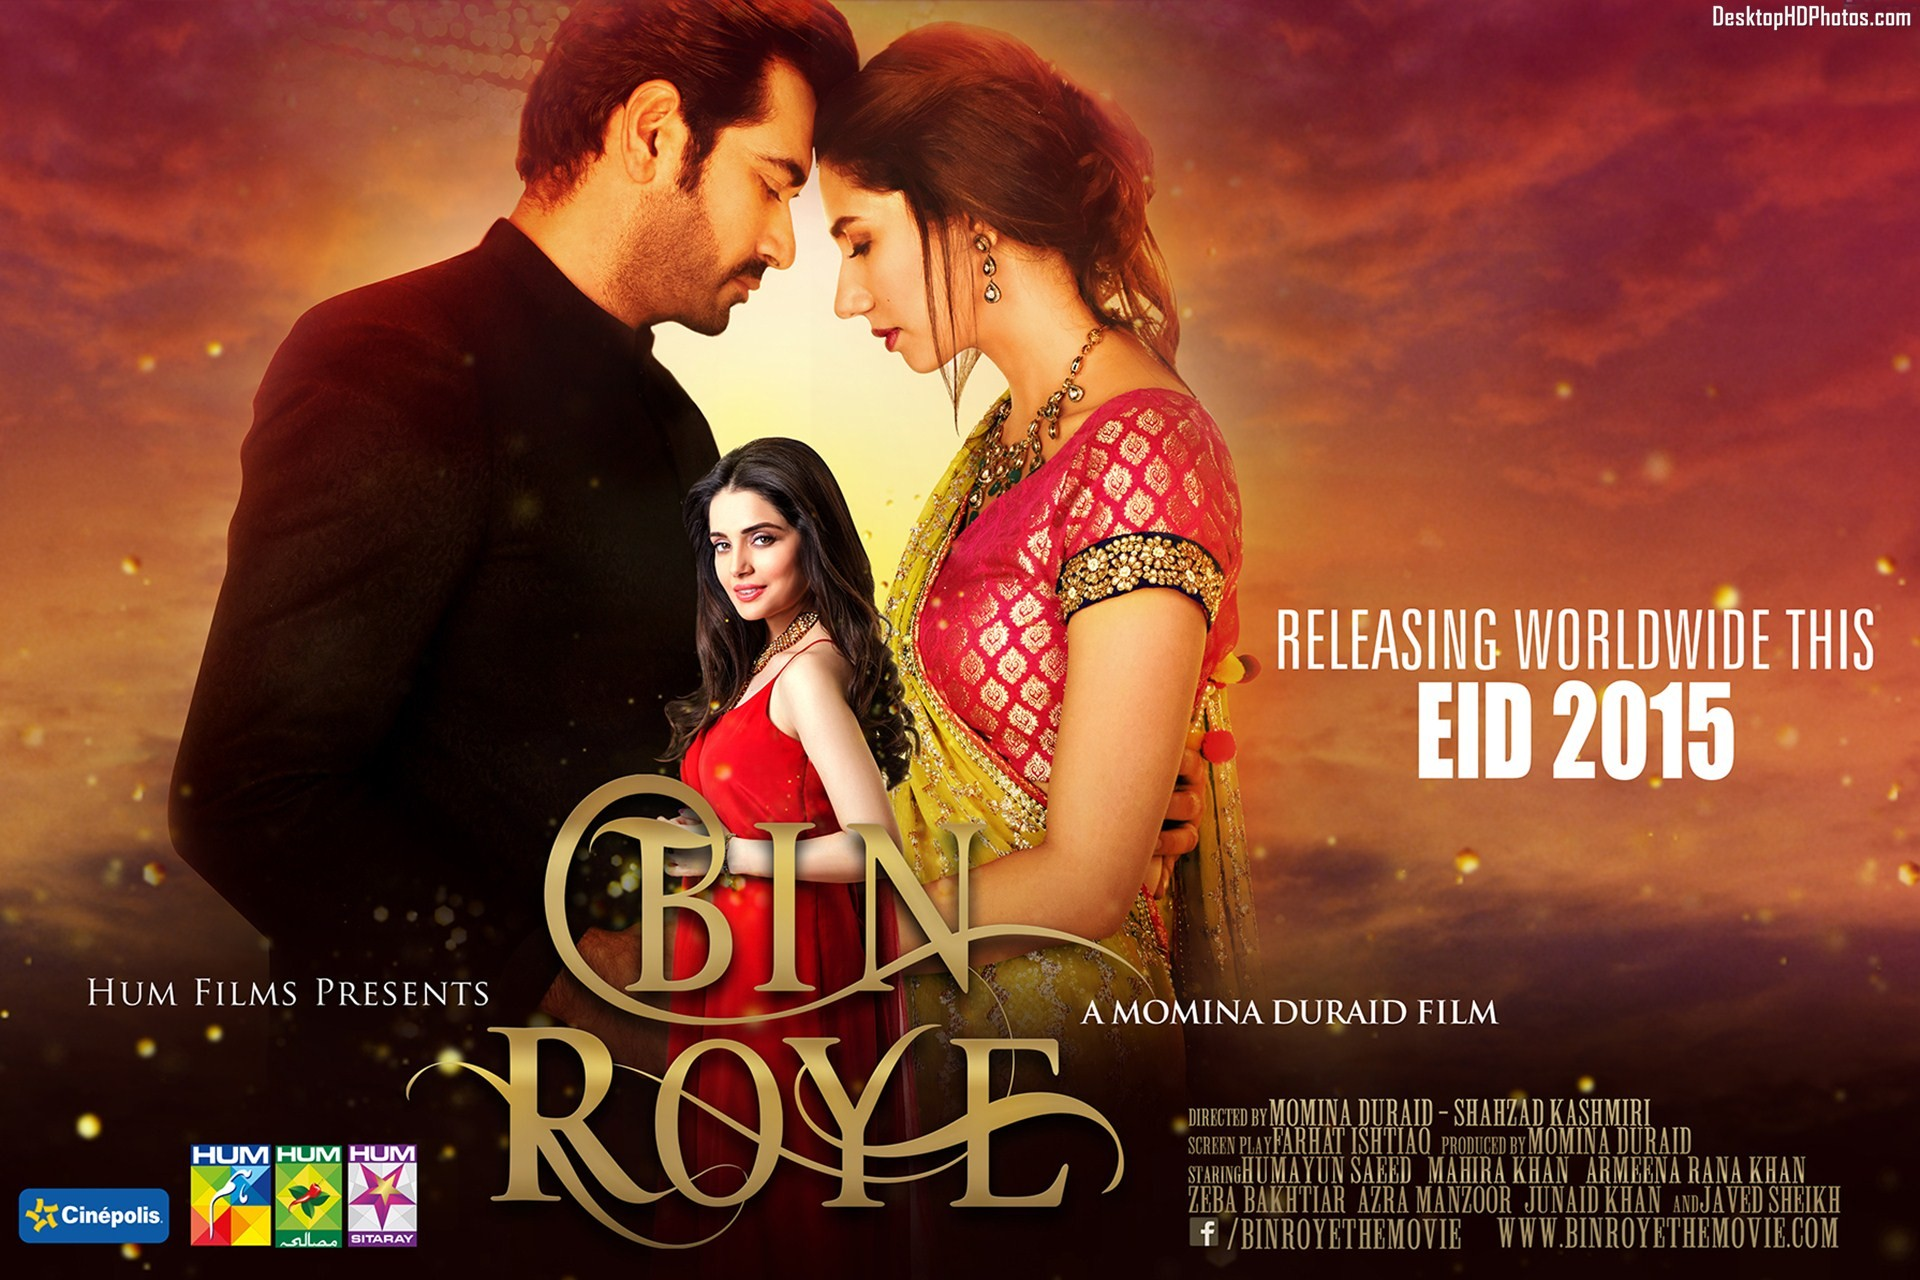 Bin Roye Pakistani Movie Trailer Addictive Blogs